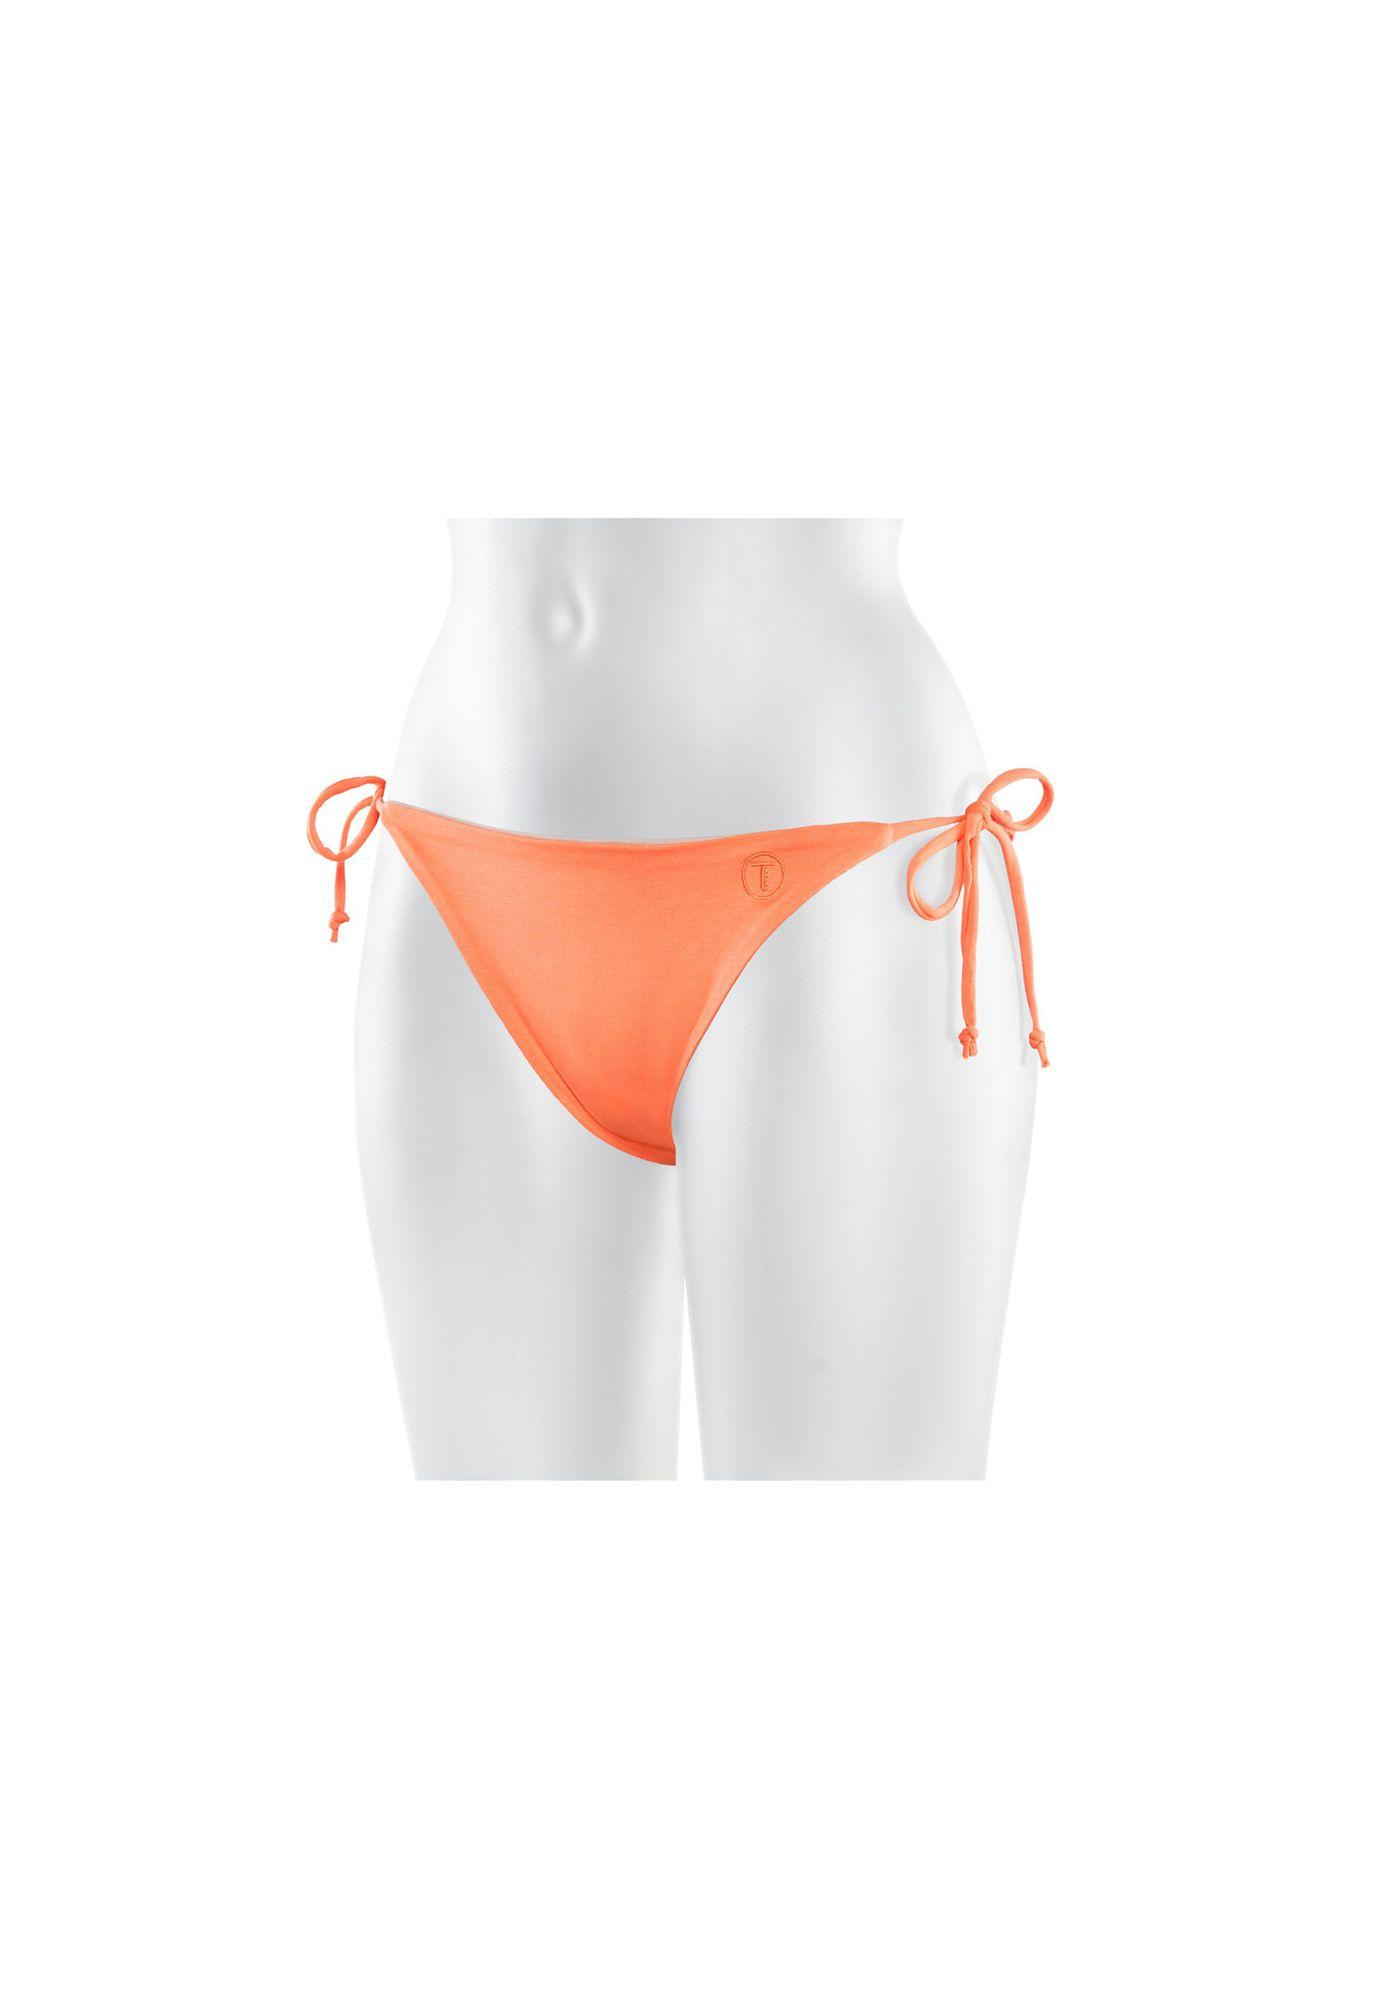 TT22 Loop Tanga Apricot